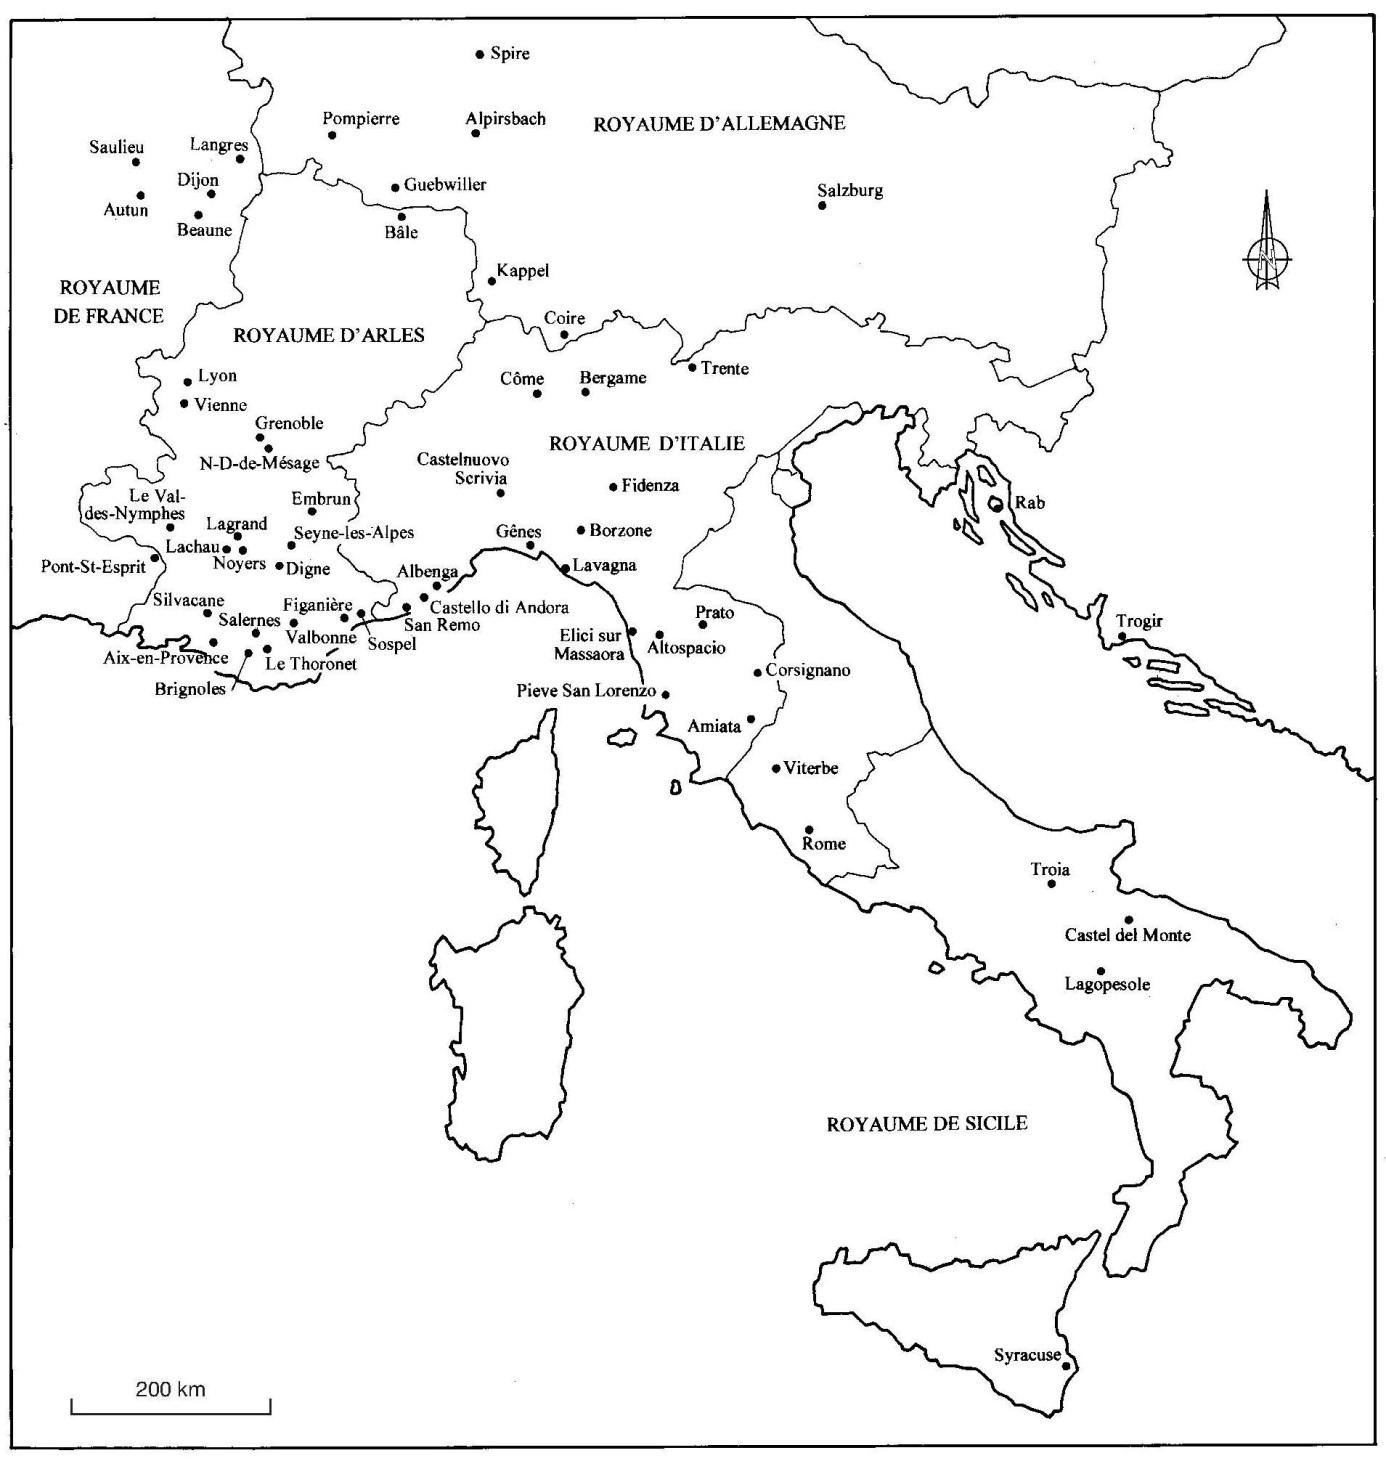 Vitesse datant Prato la fille im datant a l'herpès